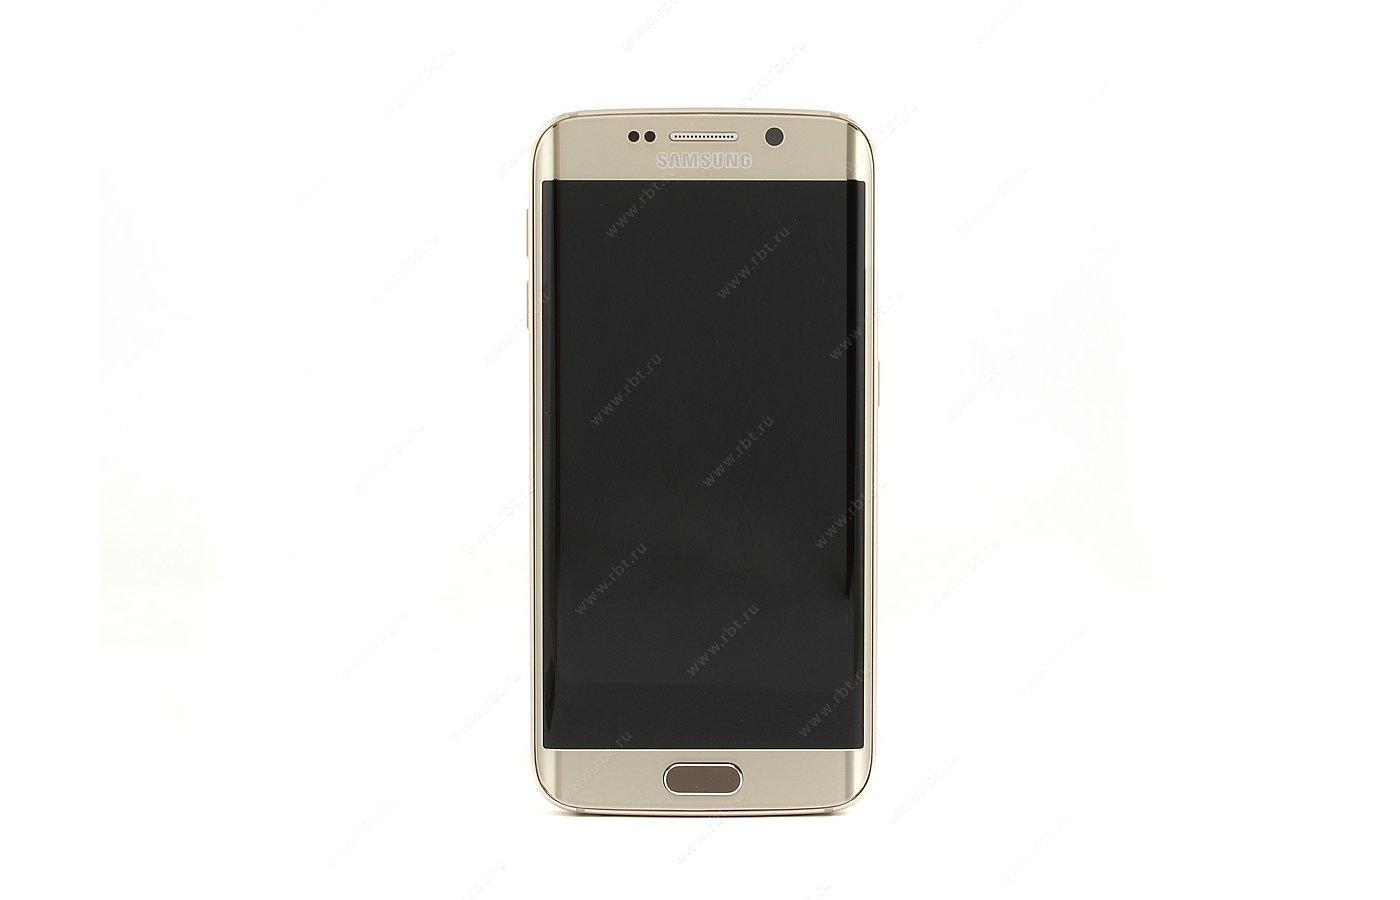 Смартфон Samsung SM-G925F Galaxy S6 Edge 32GB platinum gold